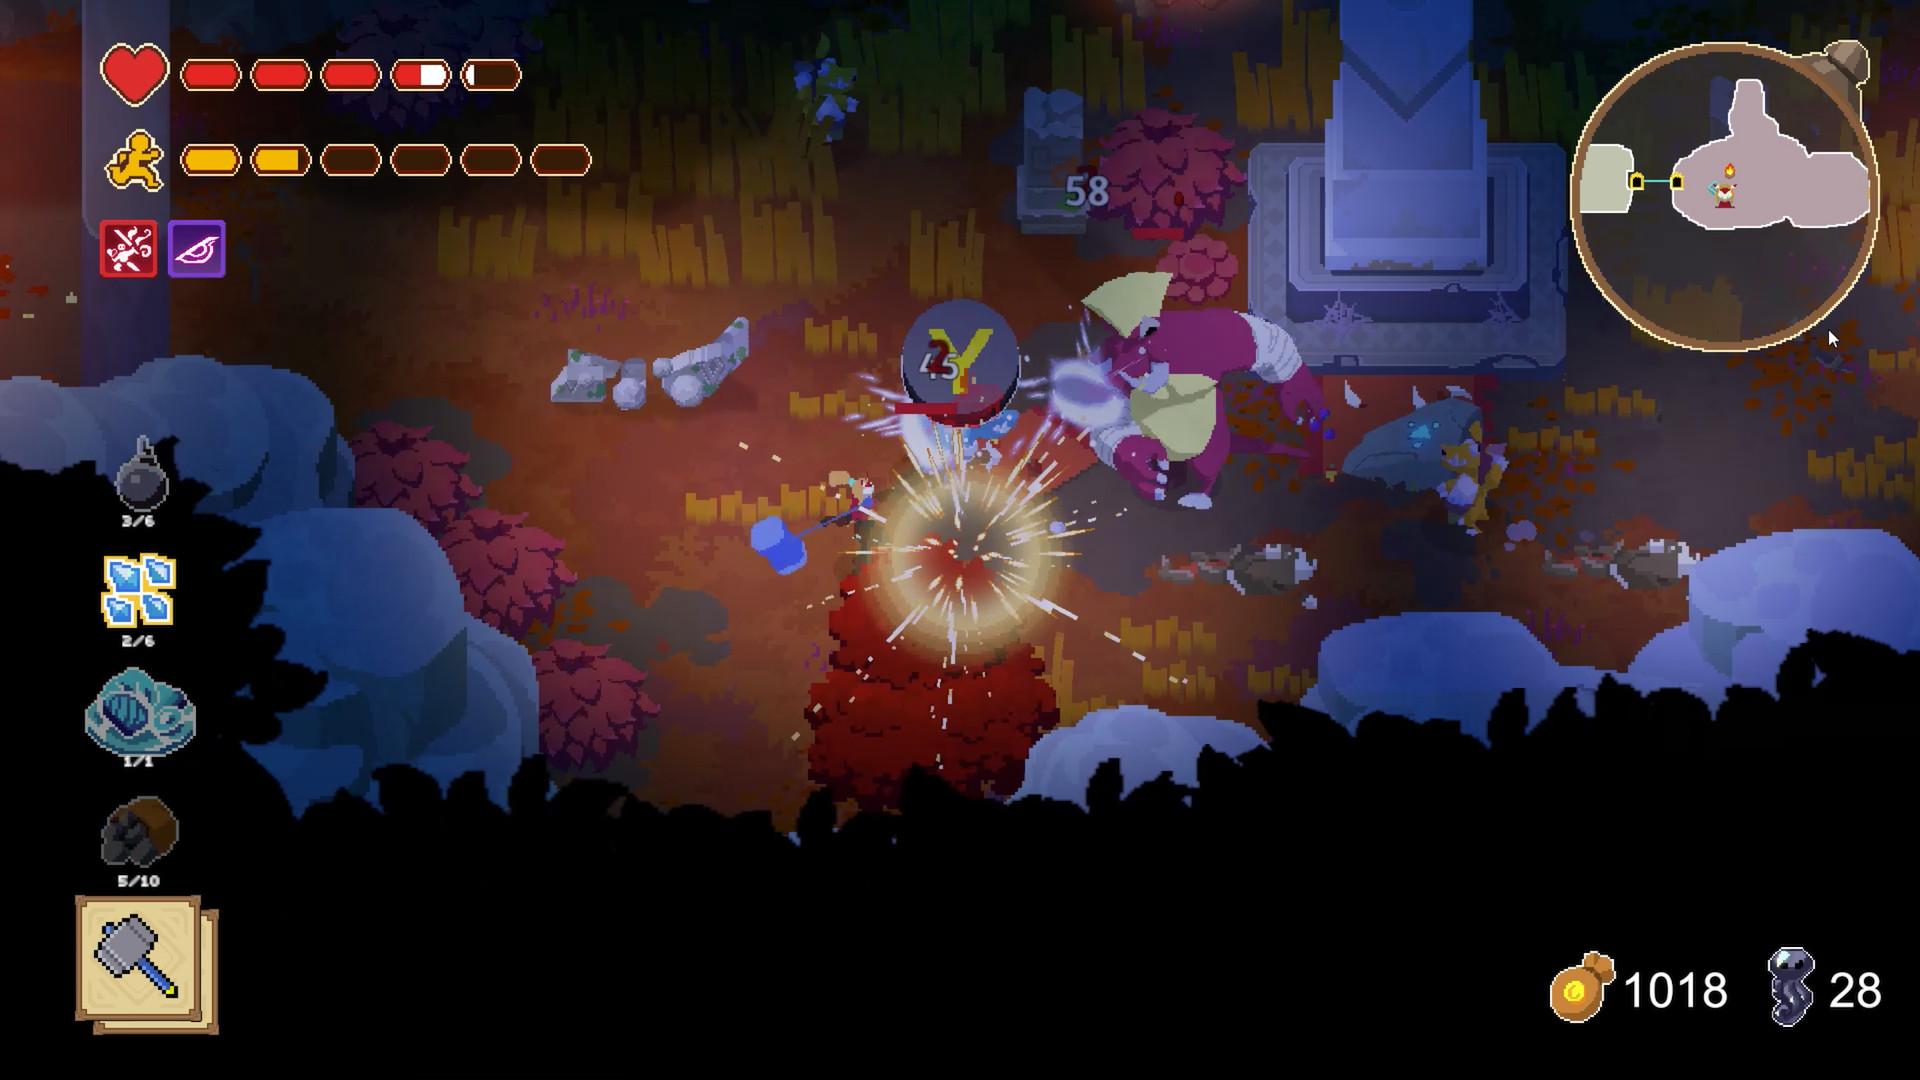 2D塞尔达式Roguelike《轮回深渊》确认1月15日发售